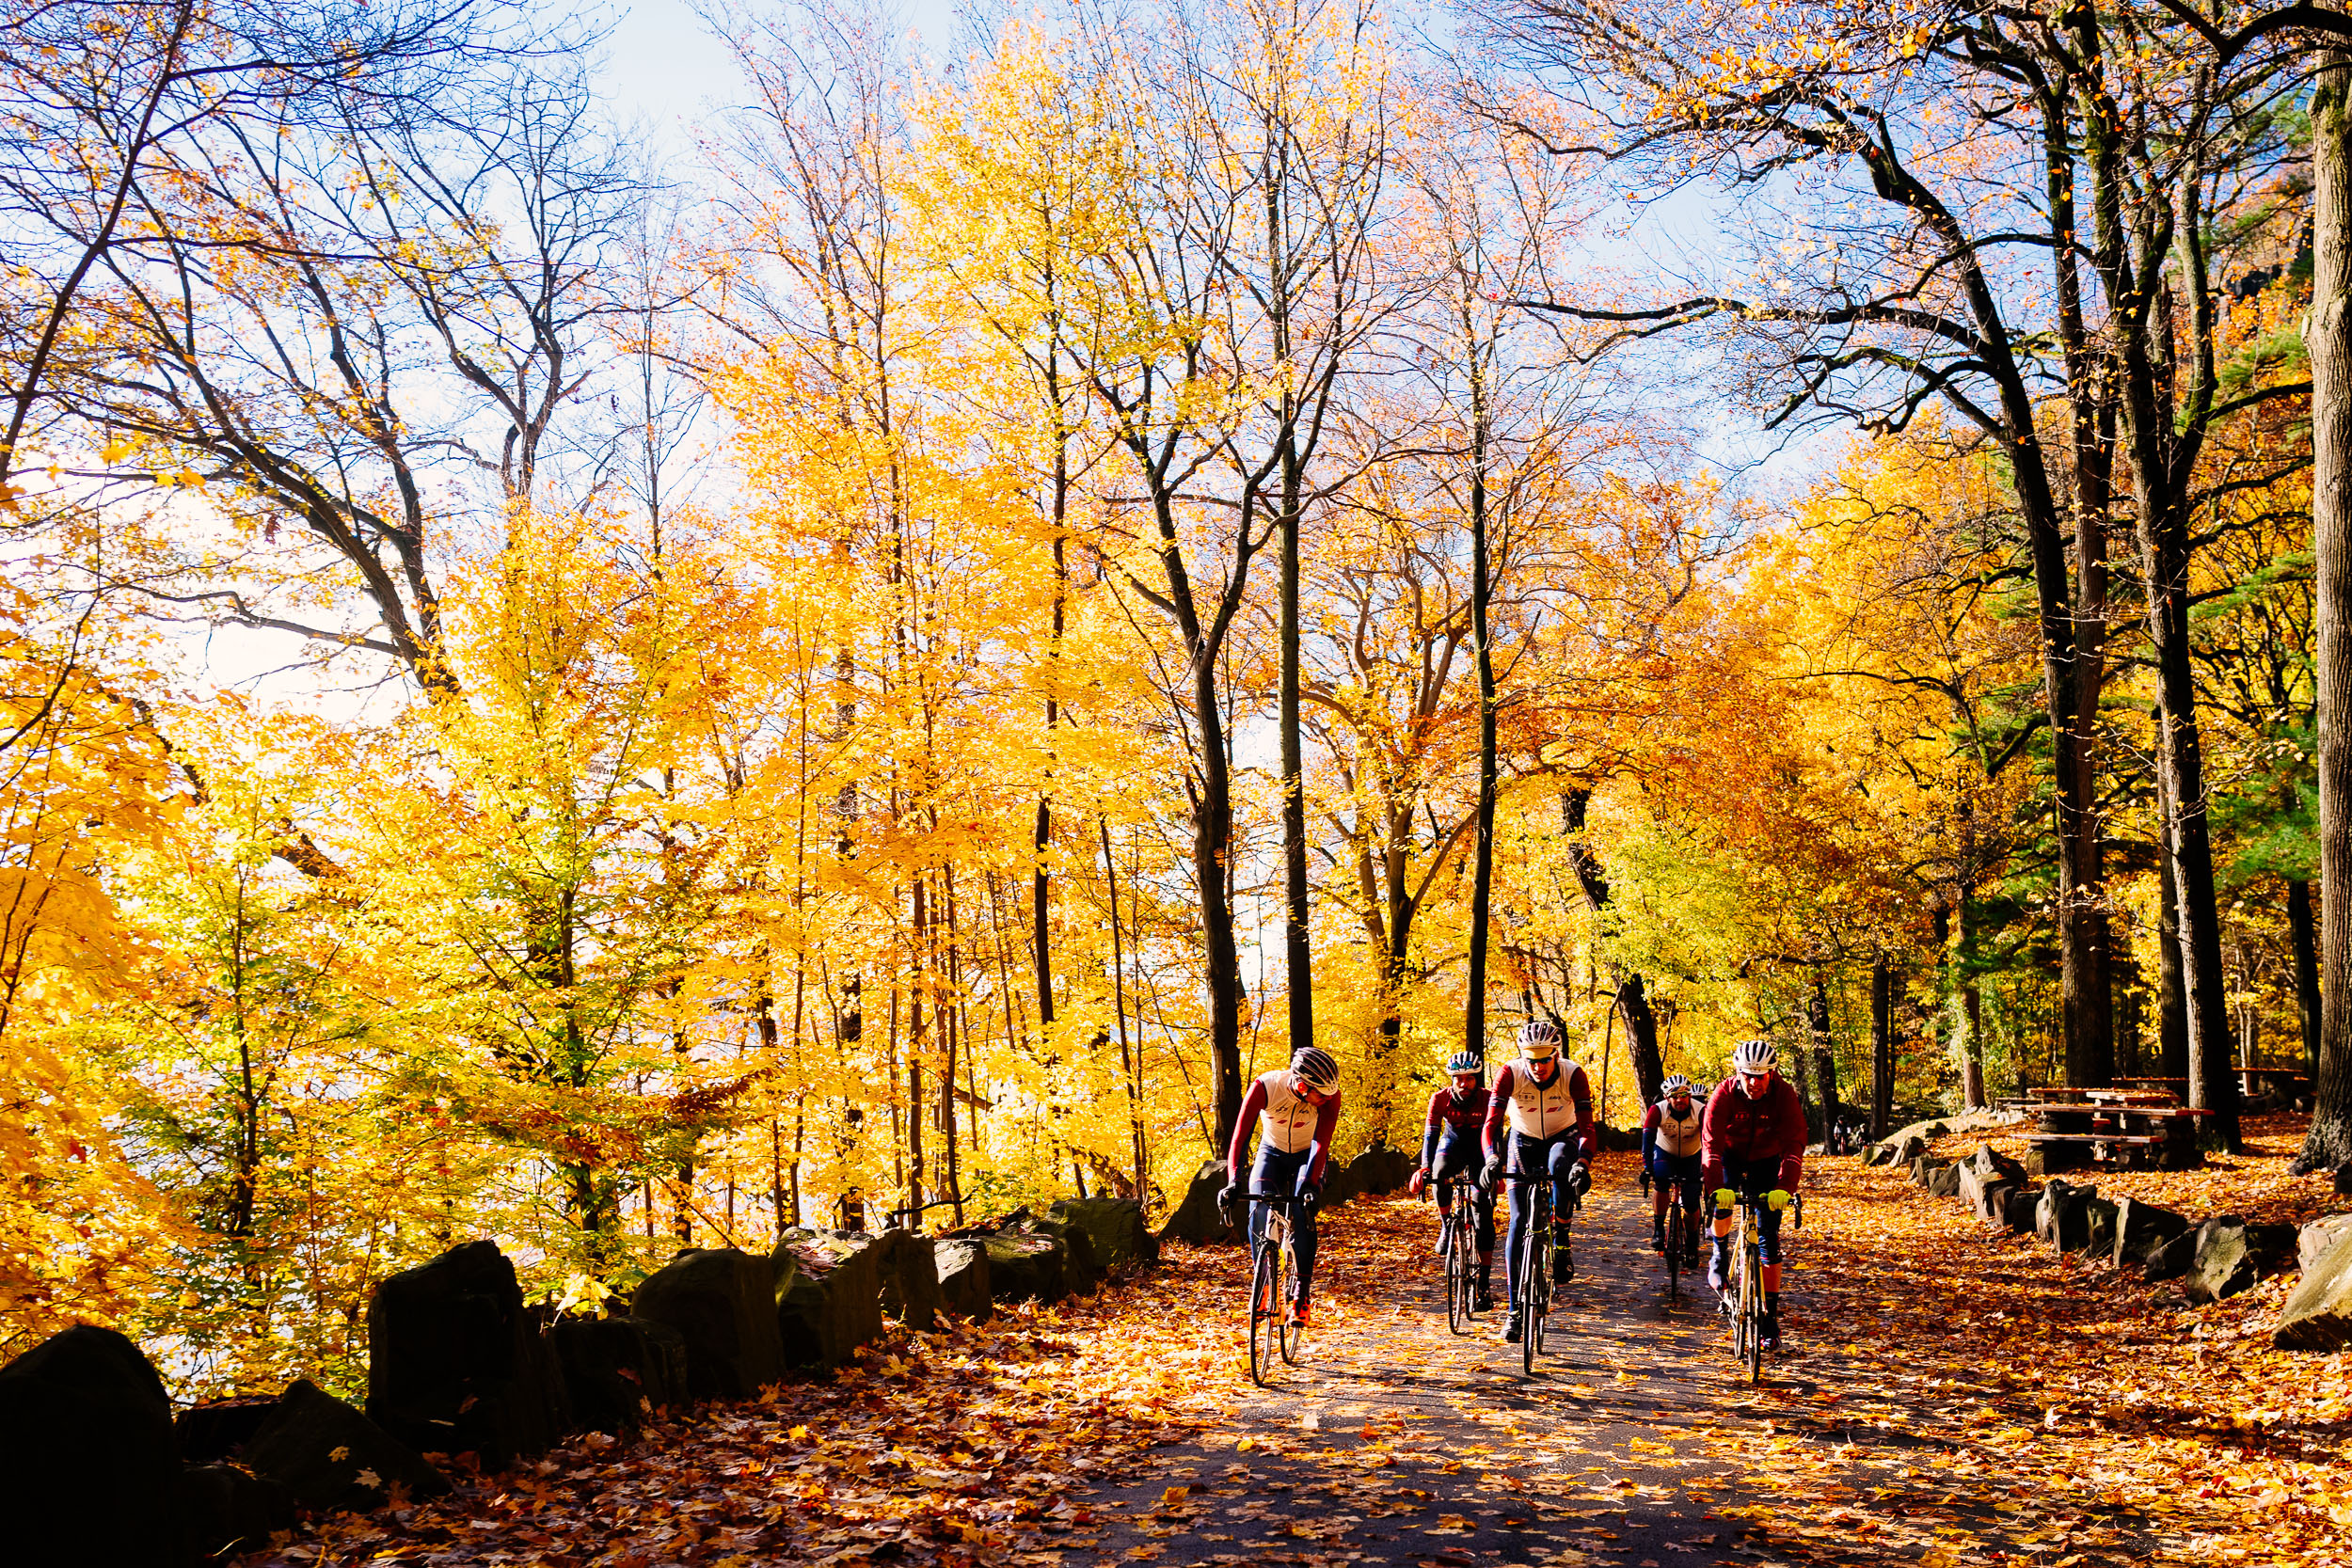 photo-rhetoric-to-be-determined-river-road-fall-foliage-5029.jpg